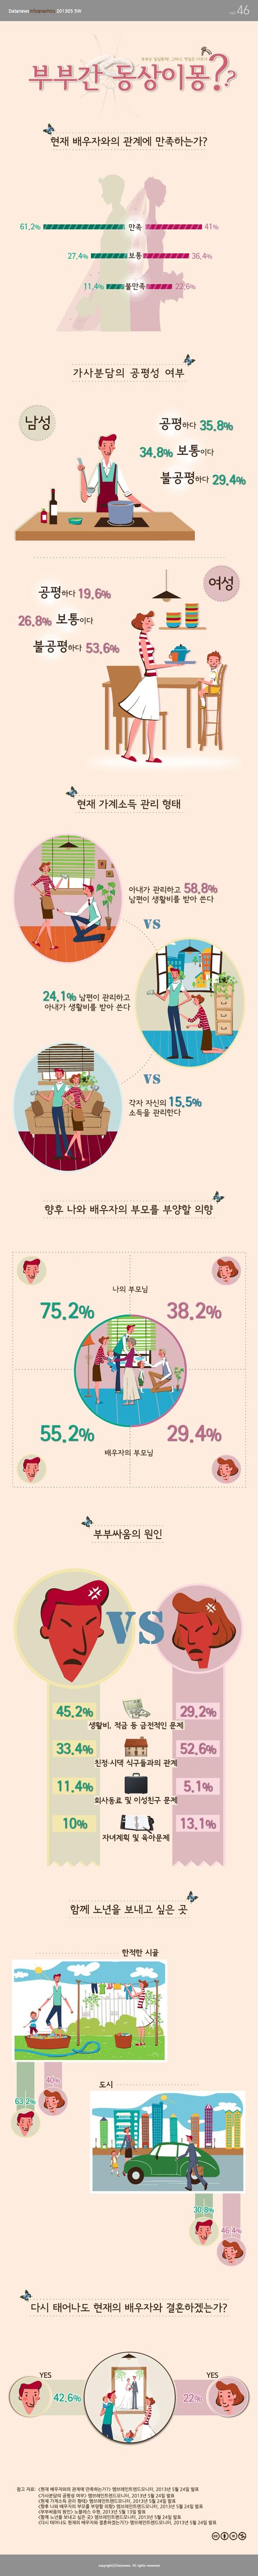 [Infographic] '부부는 일심동체?' 함께하지만 다른 생각을 하는 부부에 관한 인포그래픽